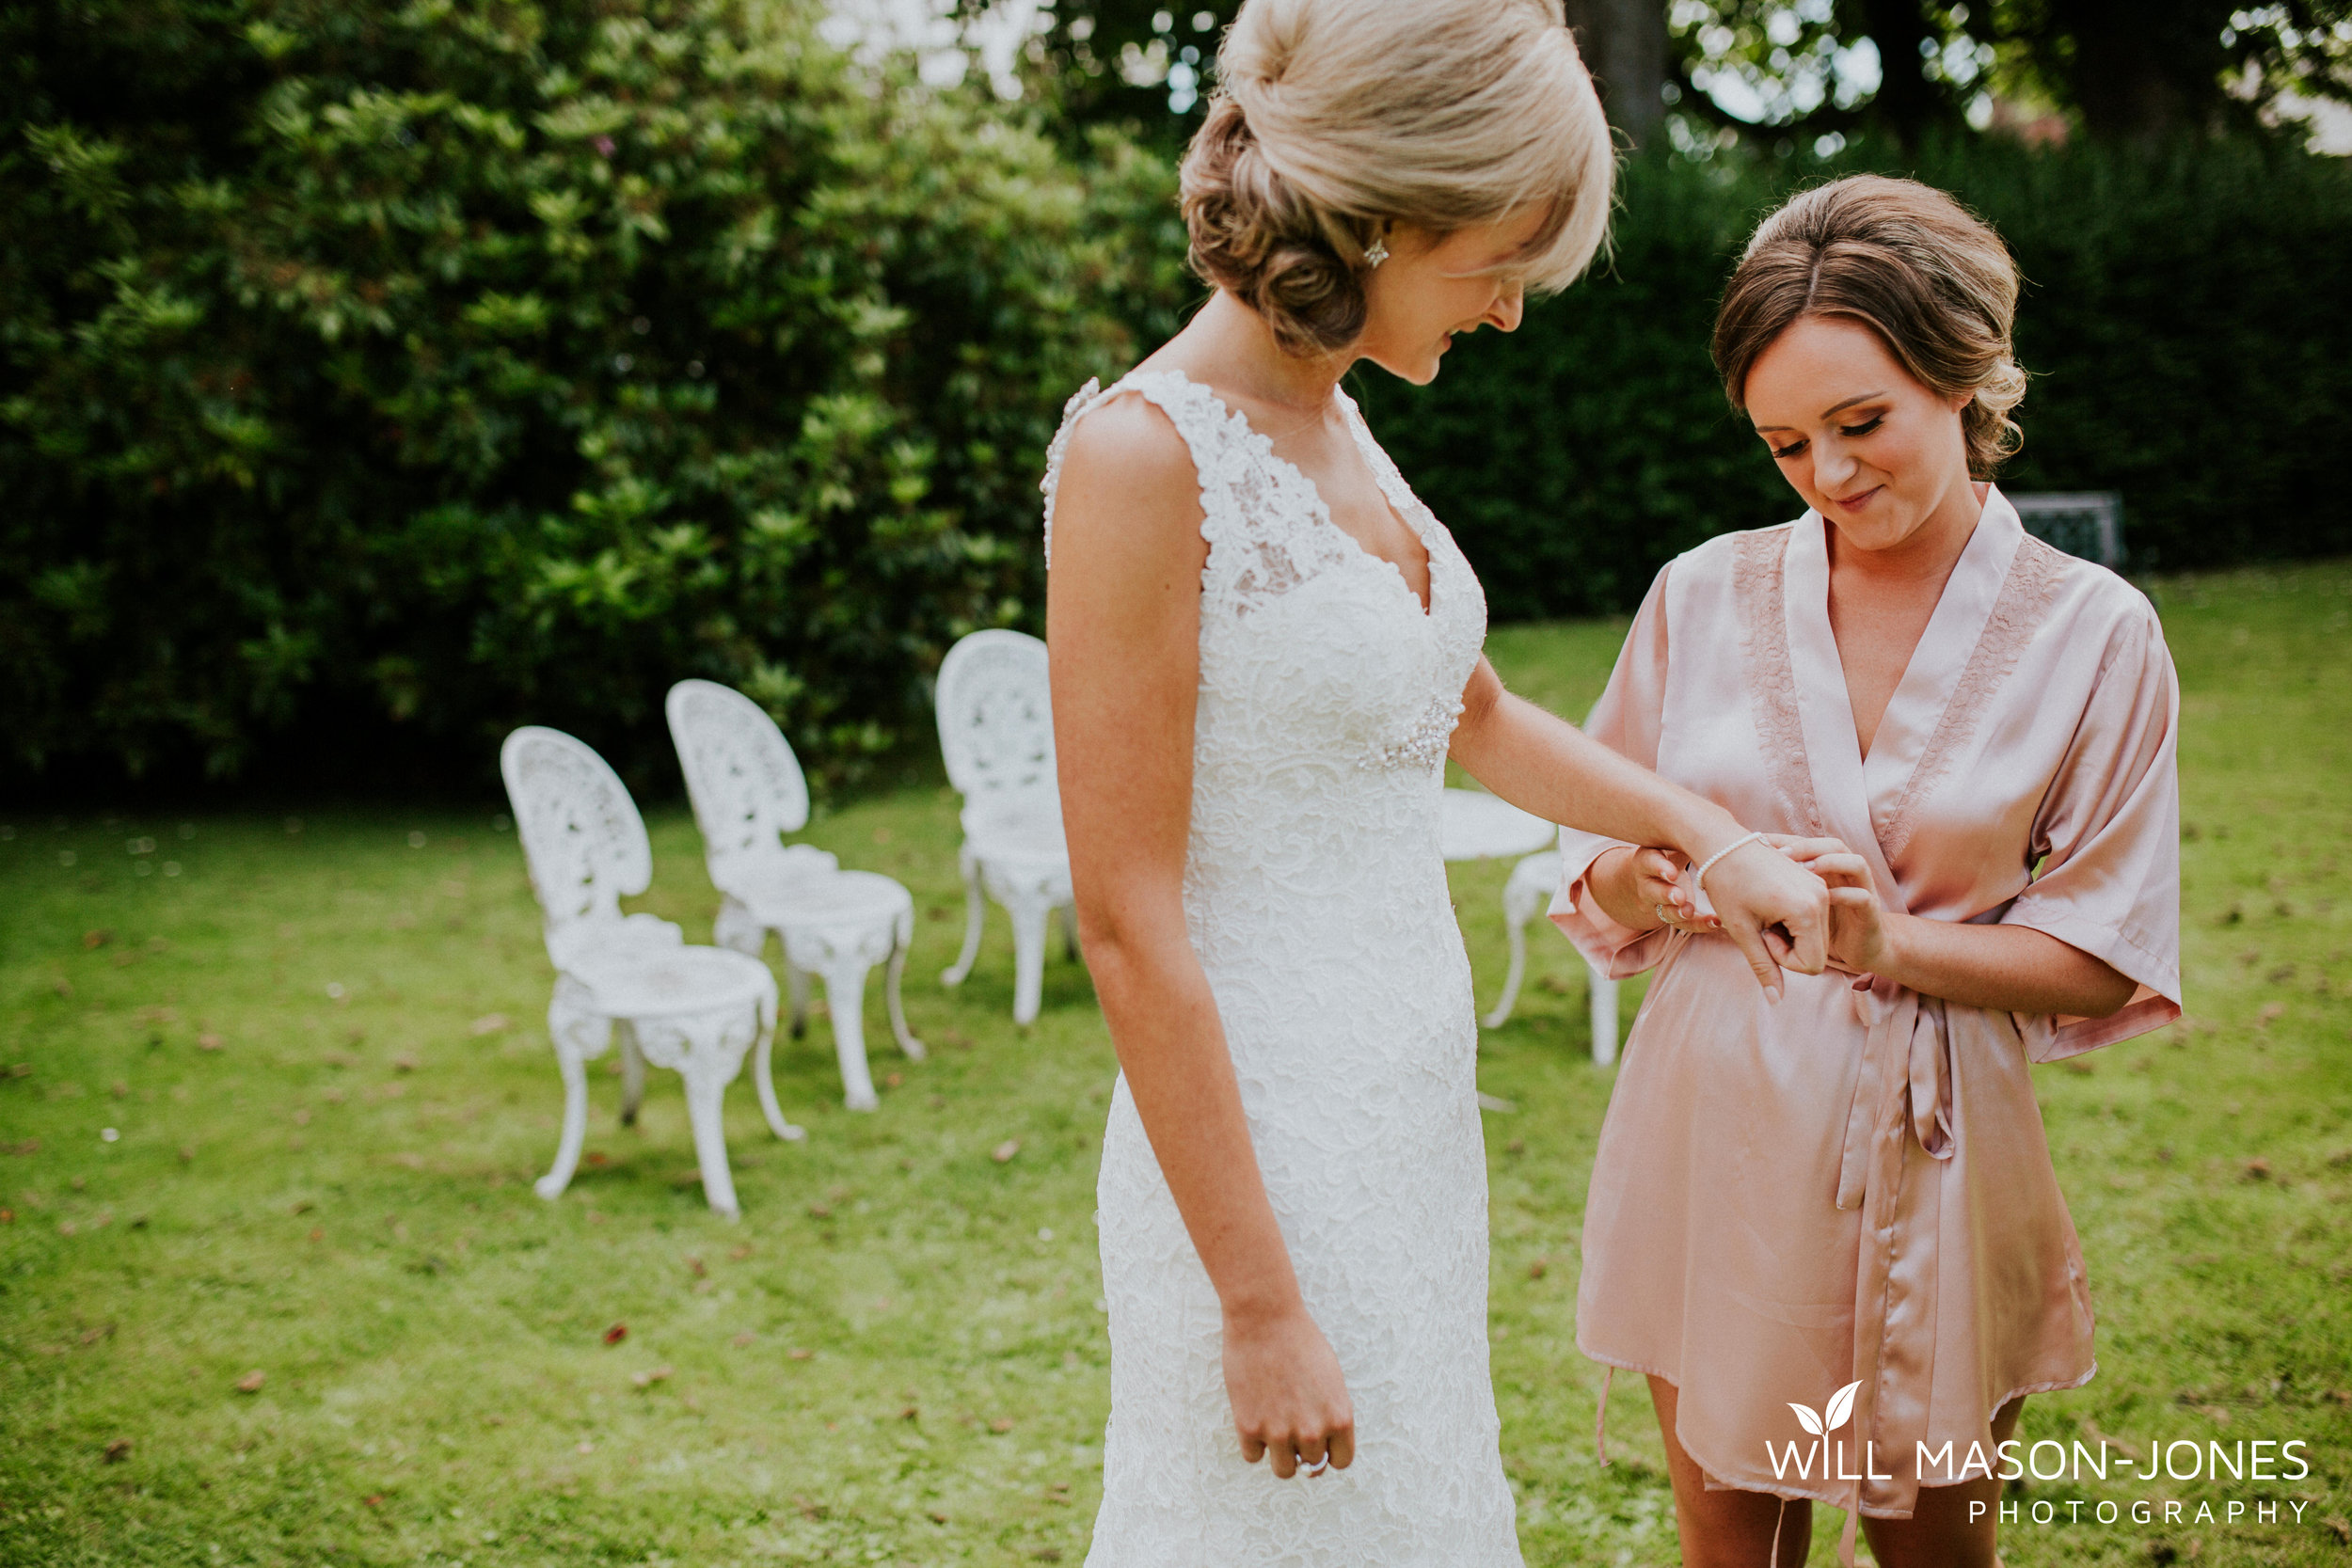 loch-lomond-destination-wedding-photographer-scotland-uk-wales-26.jpg